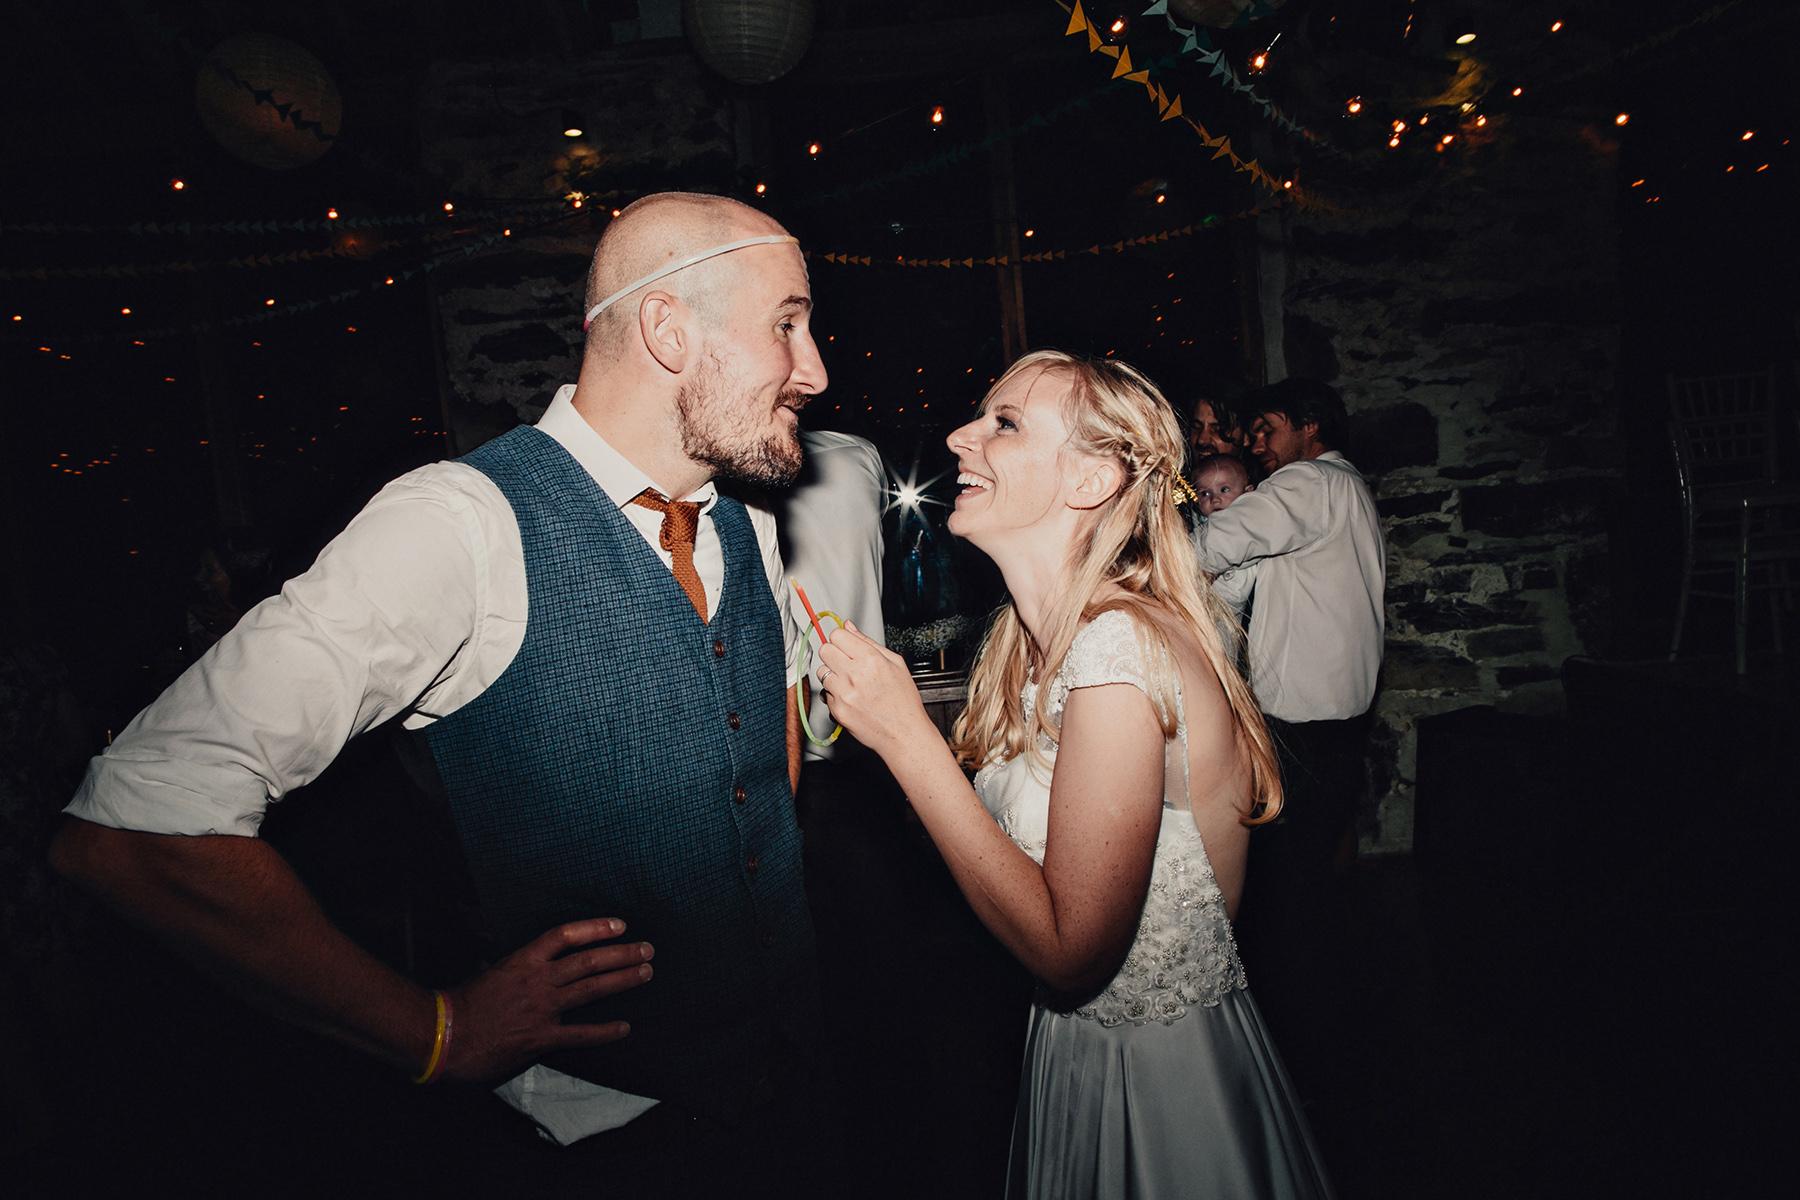 Snowdonia-Wales-Wedding-Photos-0422.jpg